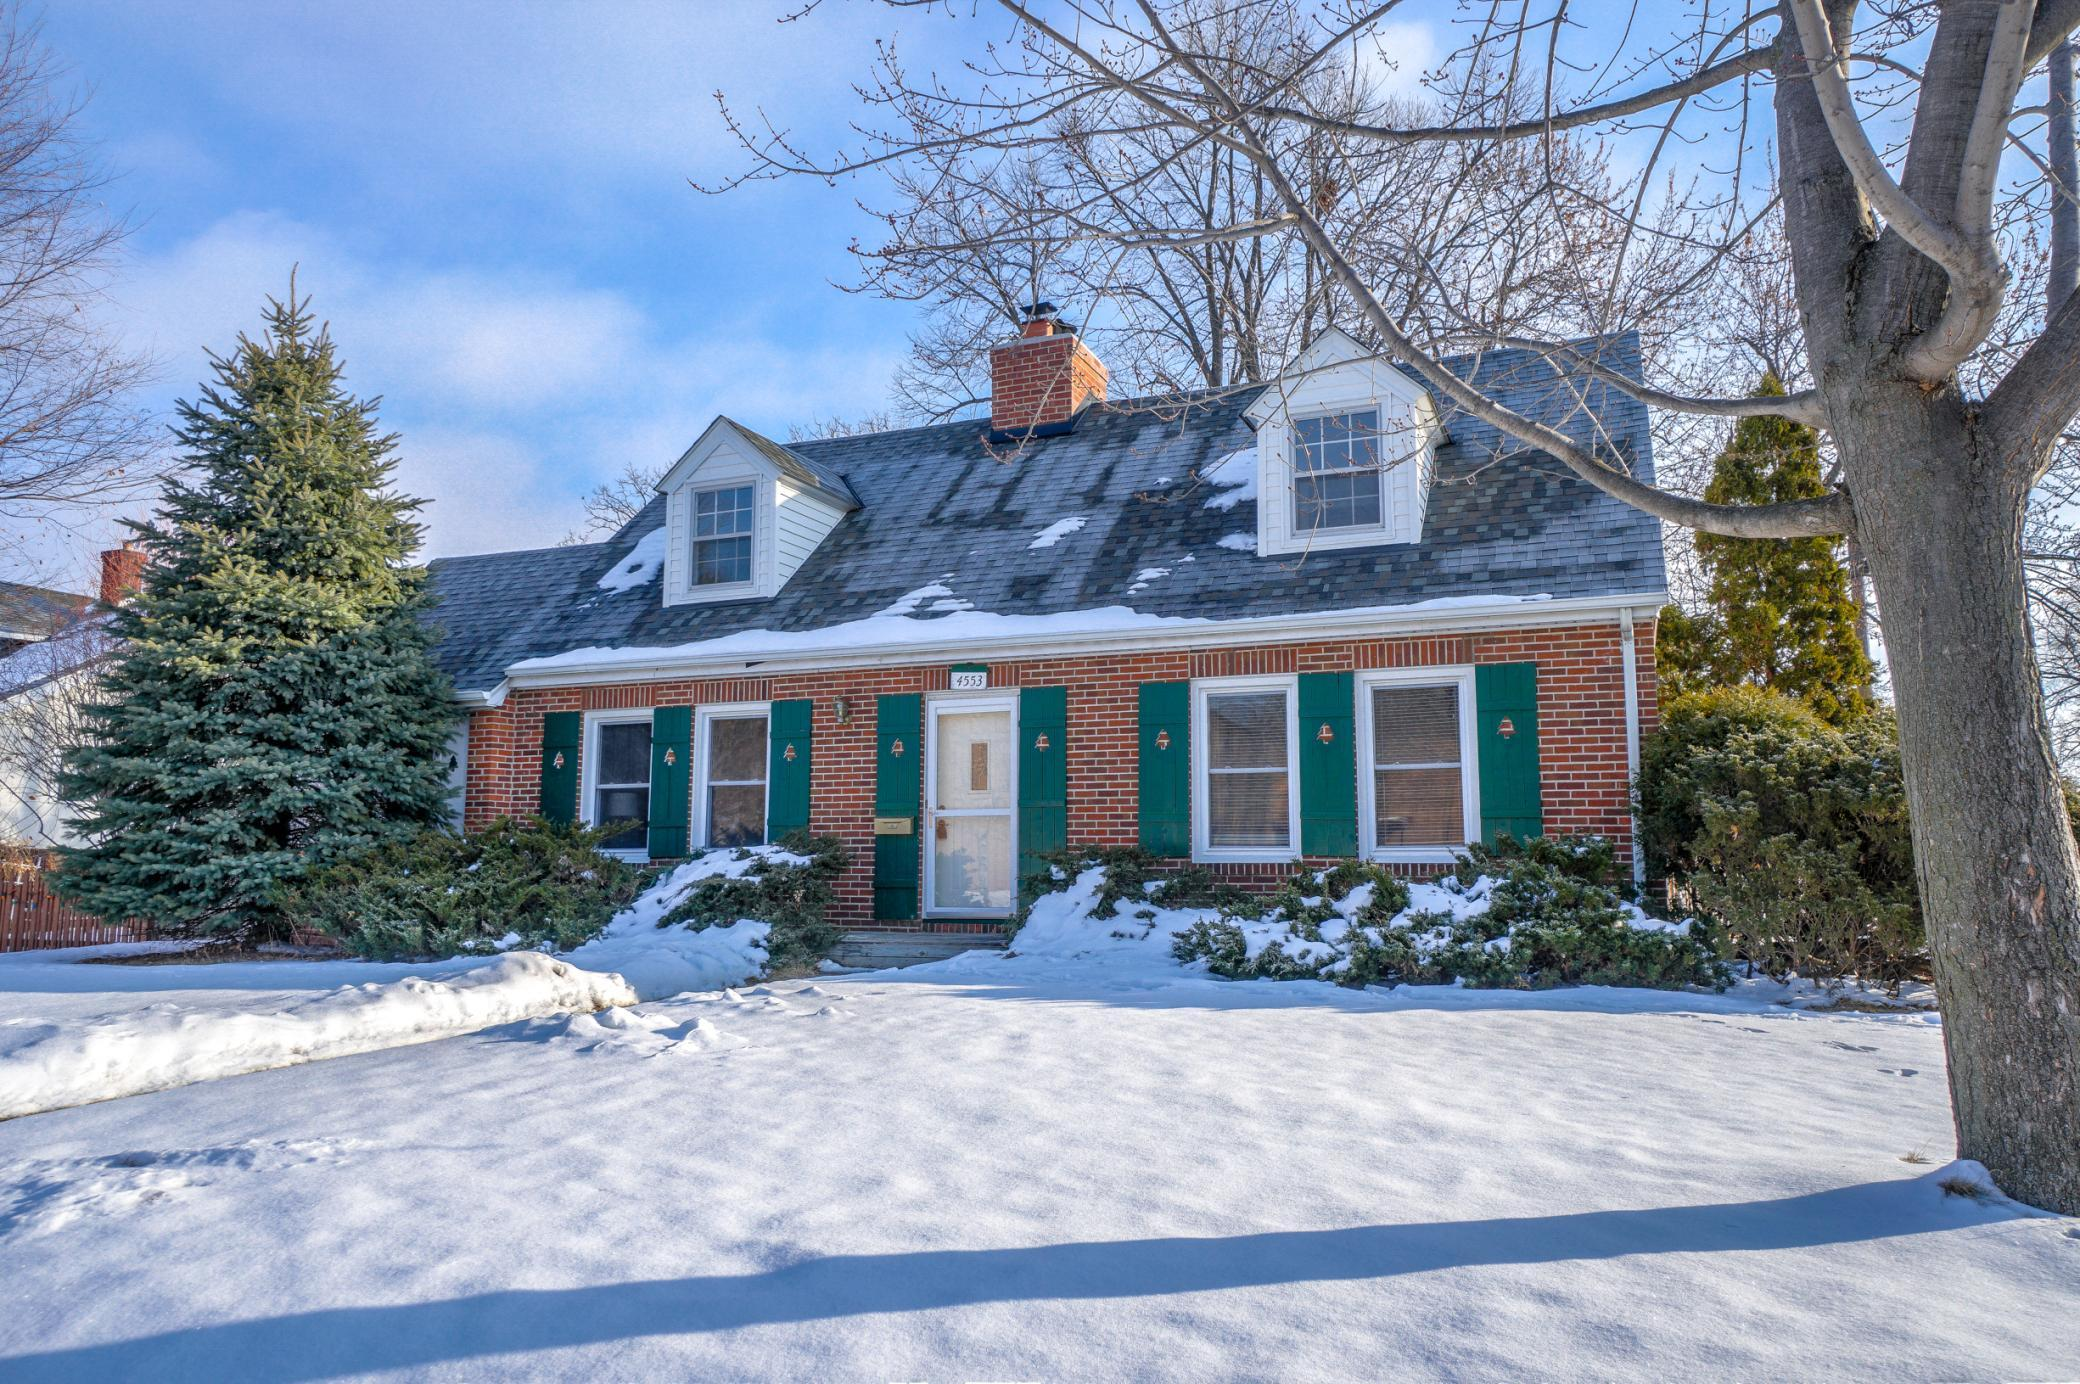 4553 17th Avenue S Property Photo - Minneapolis, MN real estate listing